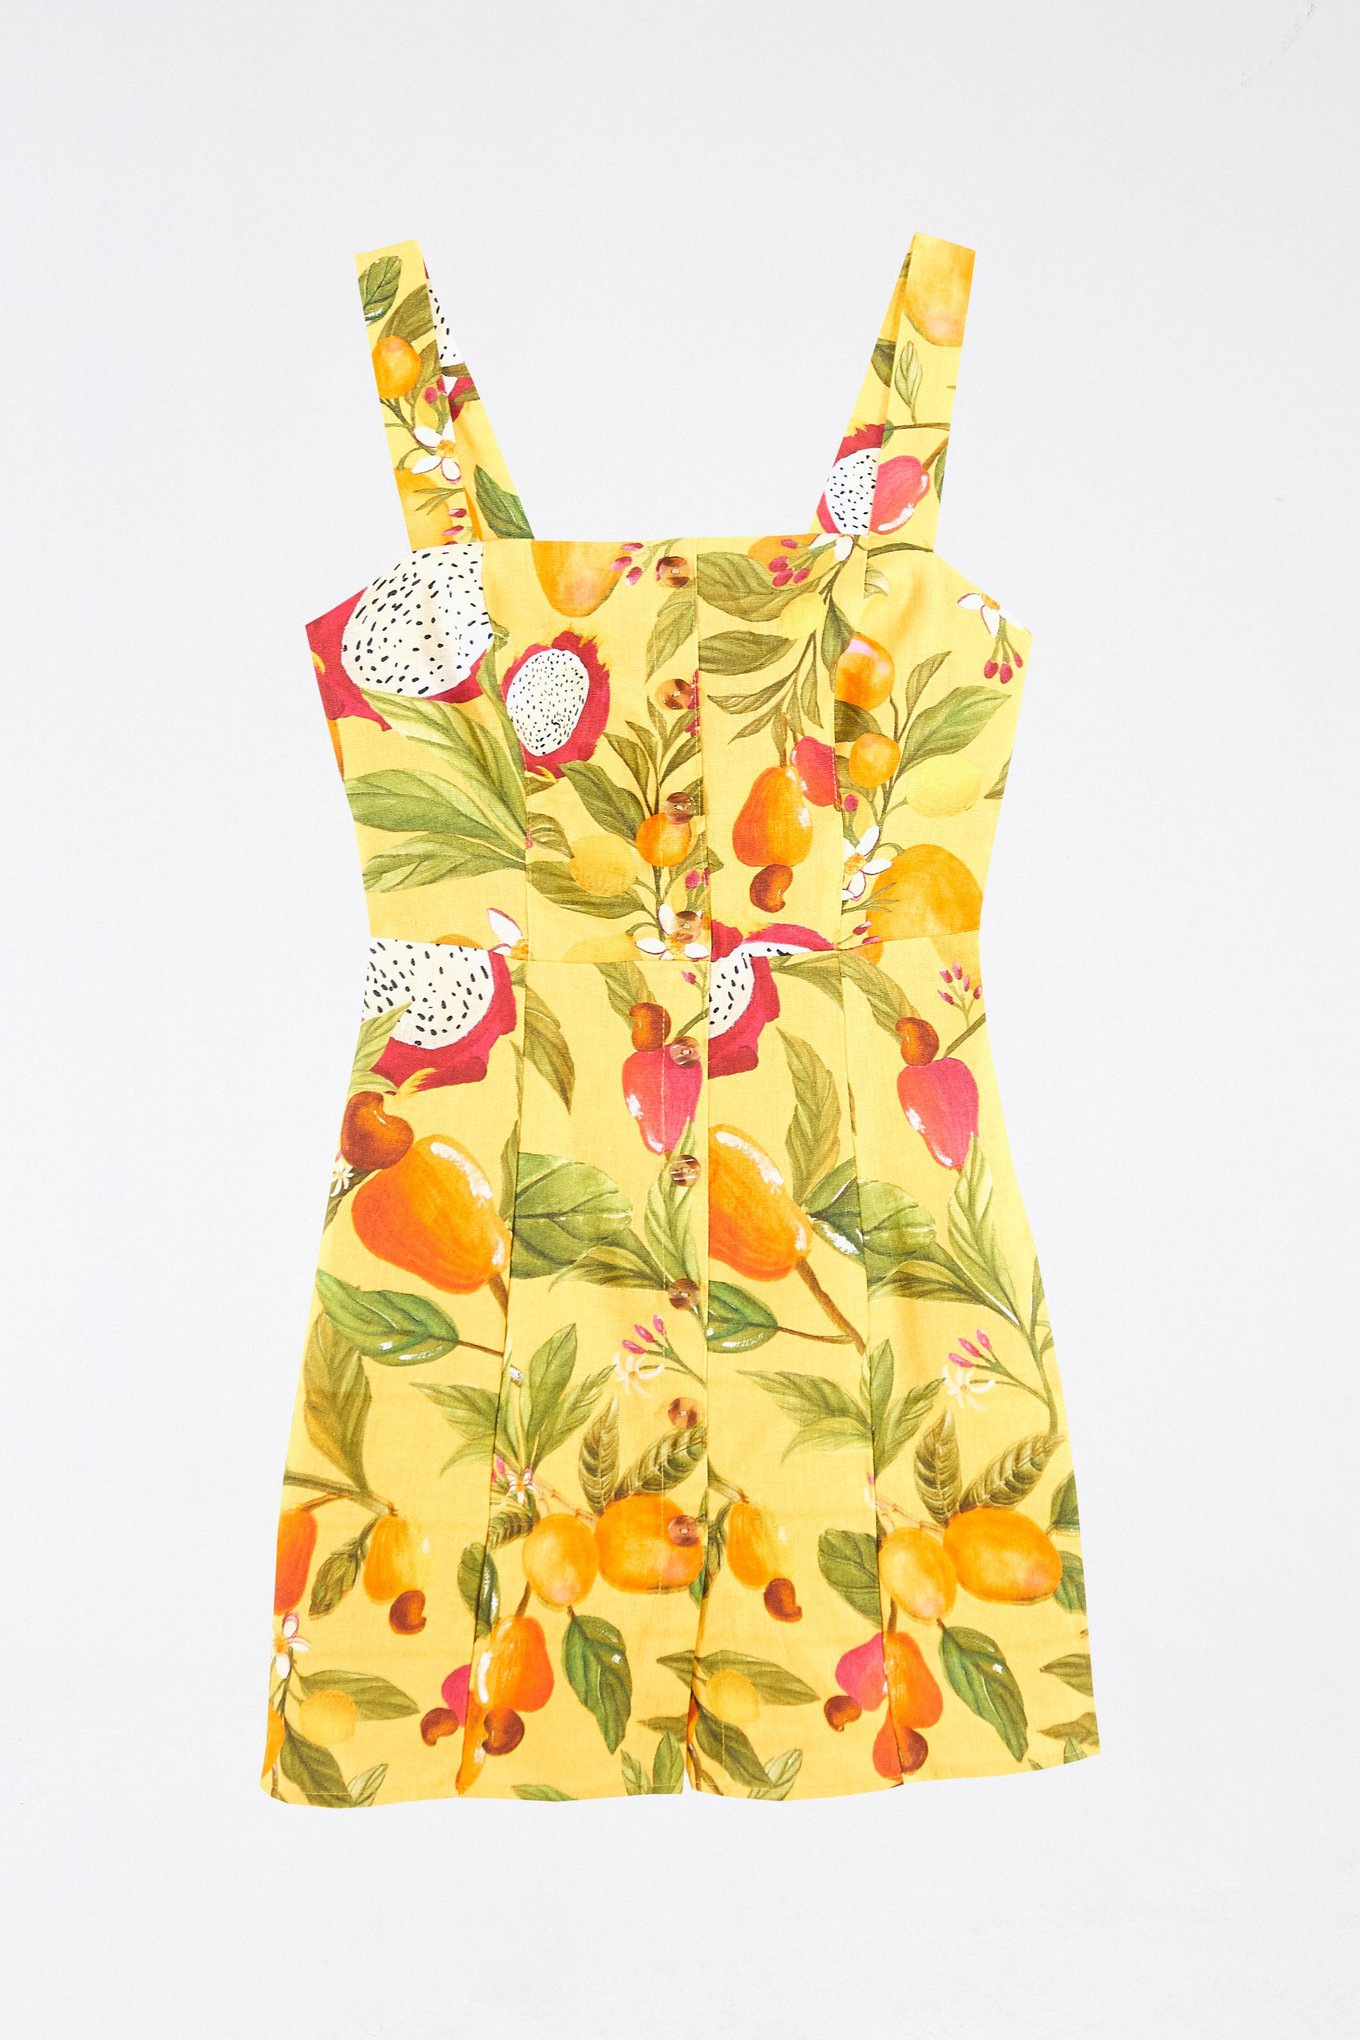 Fruit Lovers Mini Dress $135